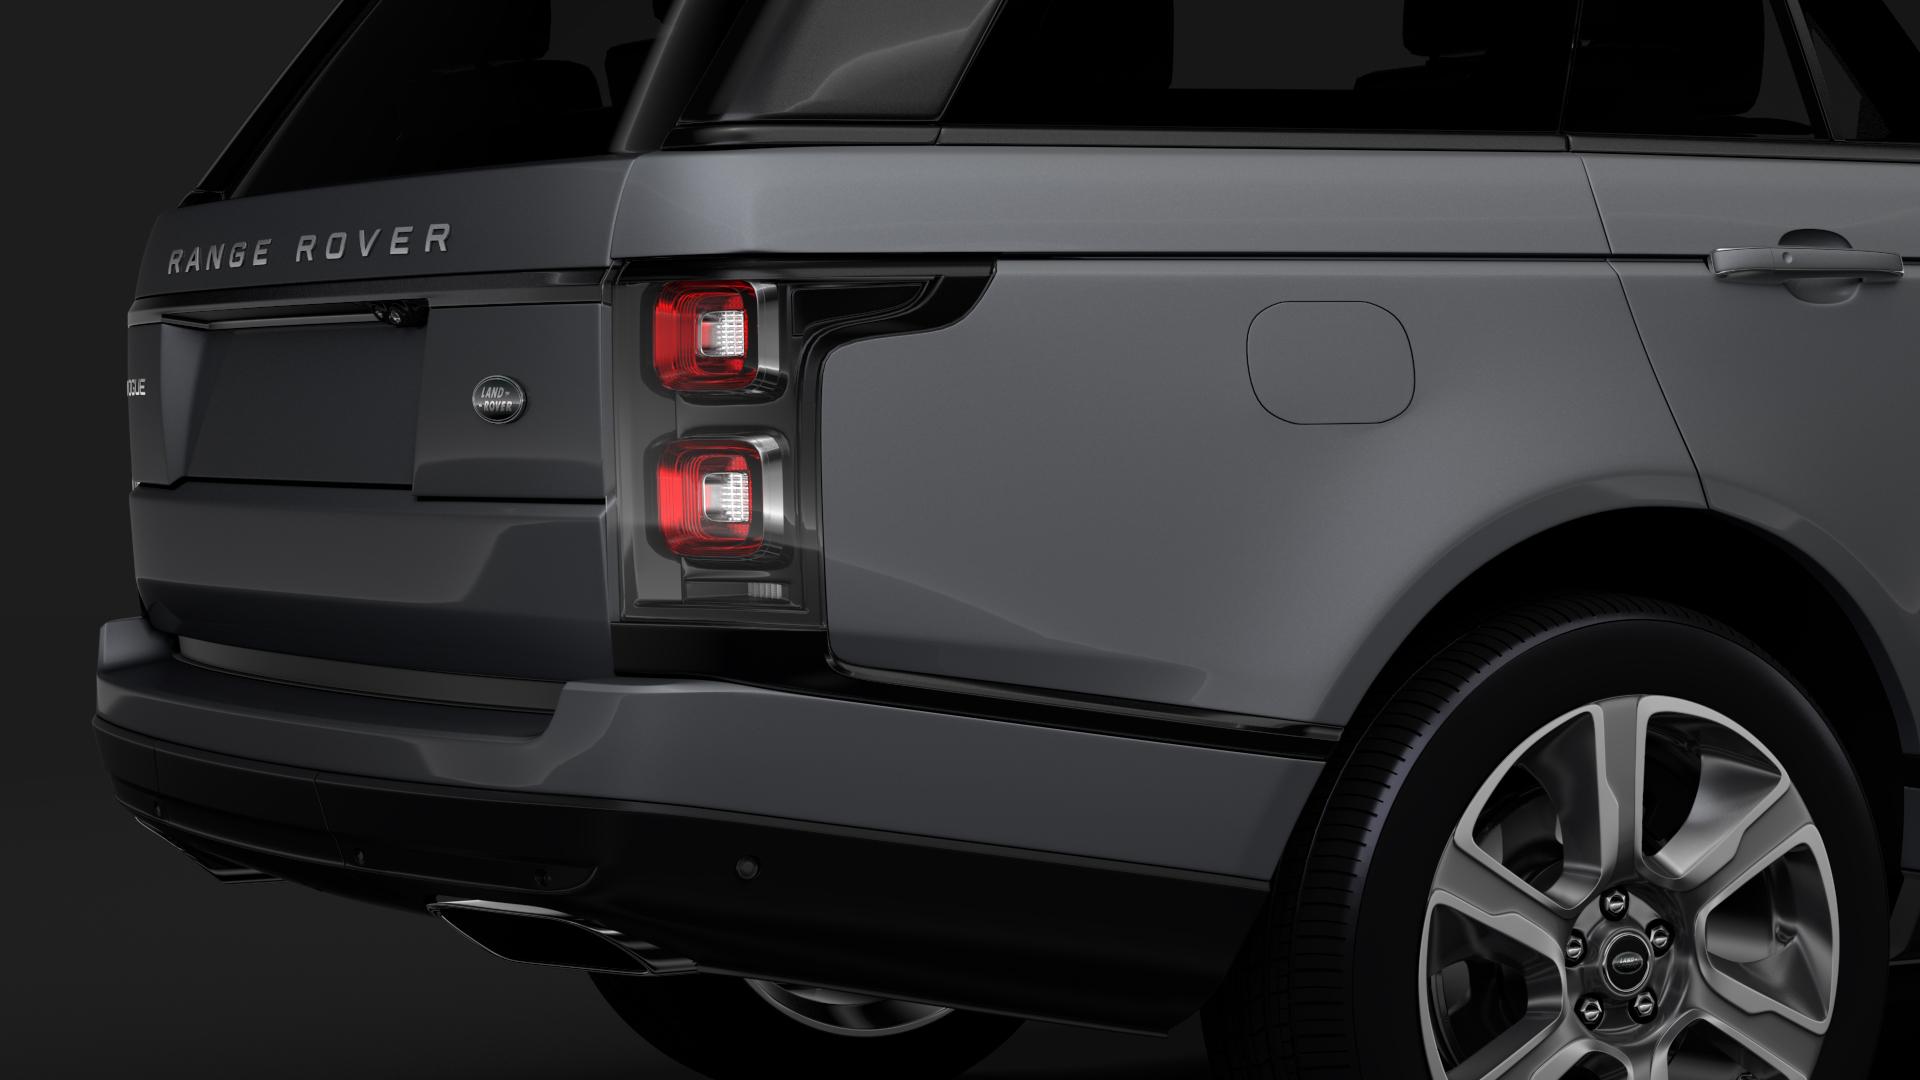 range rover vogue lwb l405 2018 3d model max fbx c4d lwo ma mb hrc xsi obj 277527